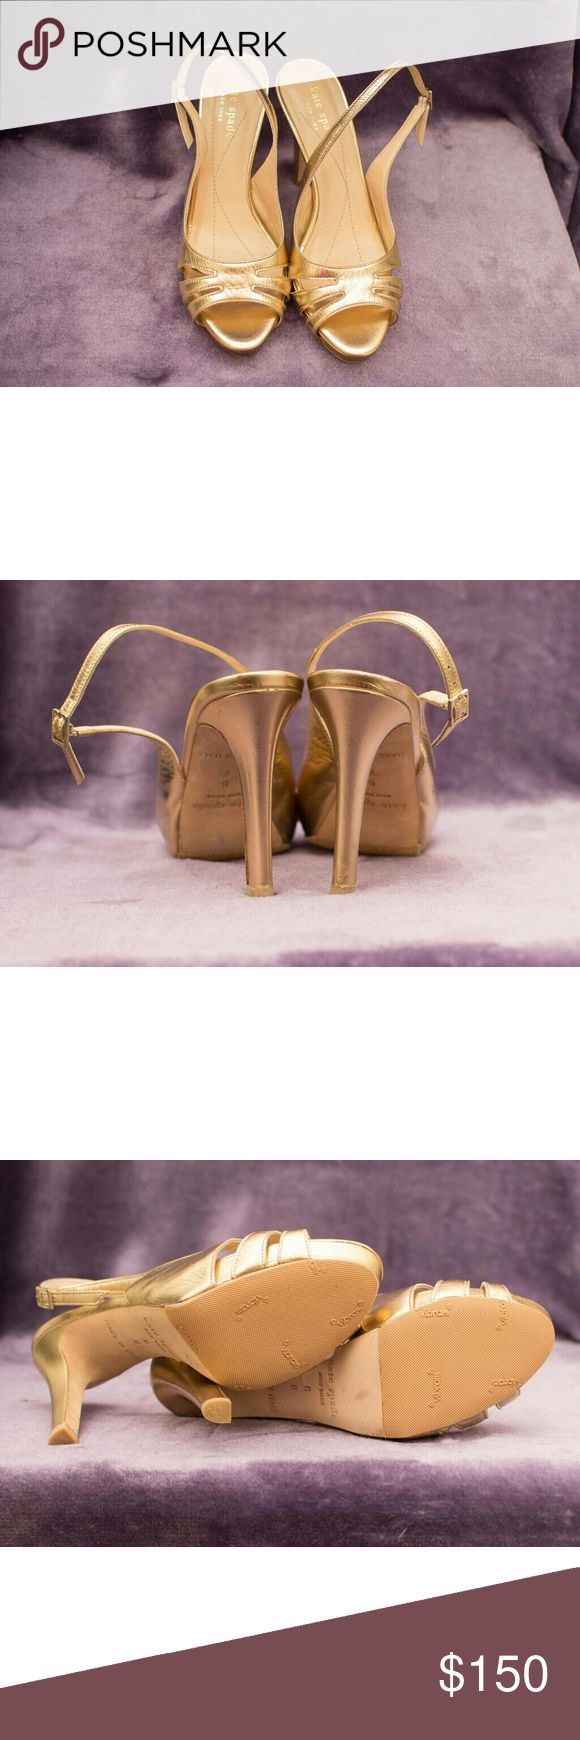 Kate Spade gold open toe heels Gorgeous gold sandal heels NWOT kate spade Shoes Heels